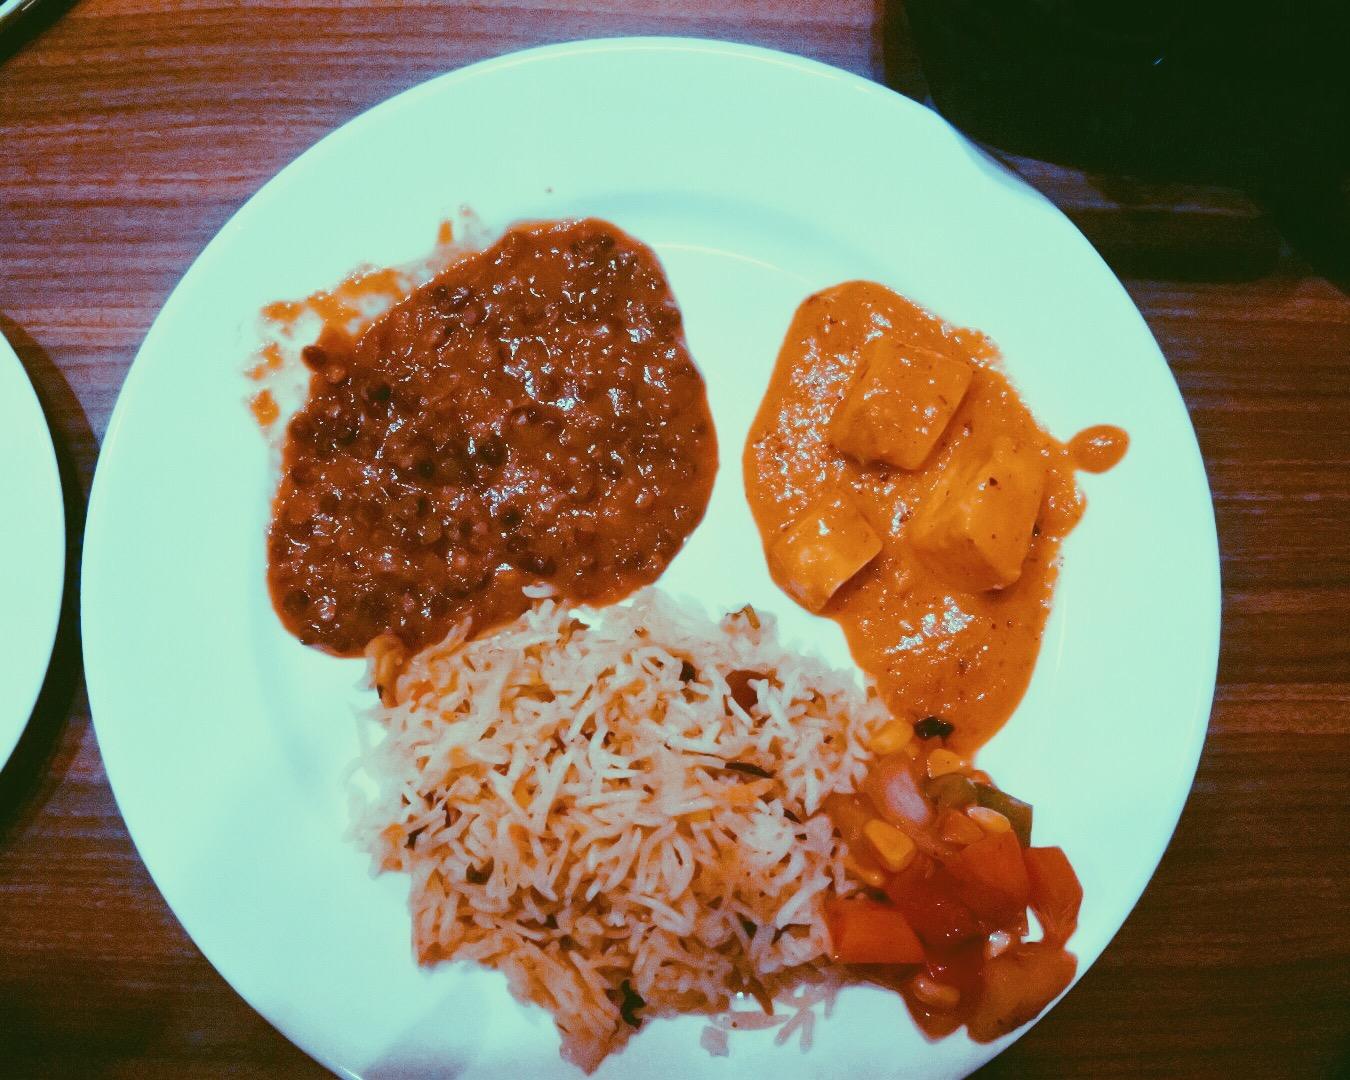 My main dish - biryani with dal, paneer, and salad